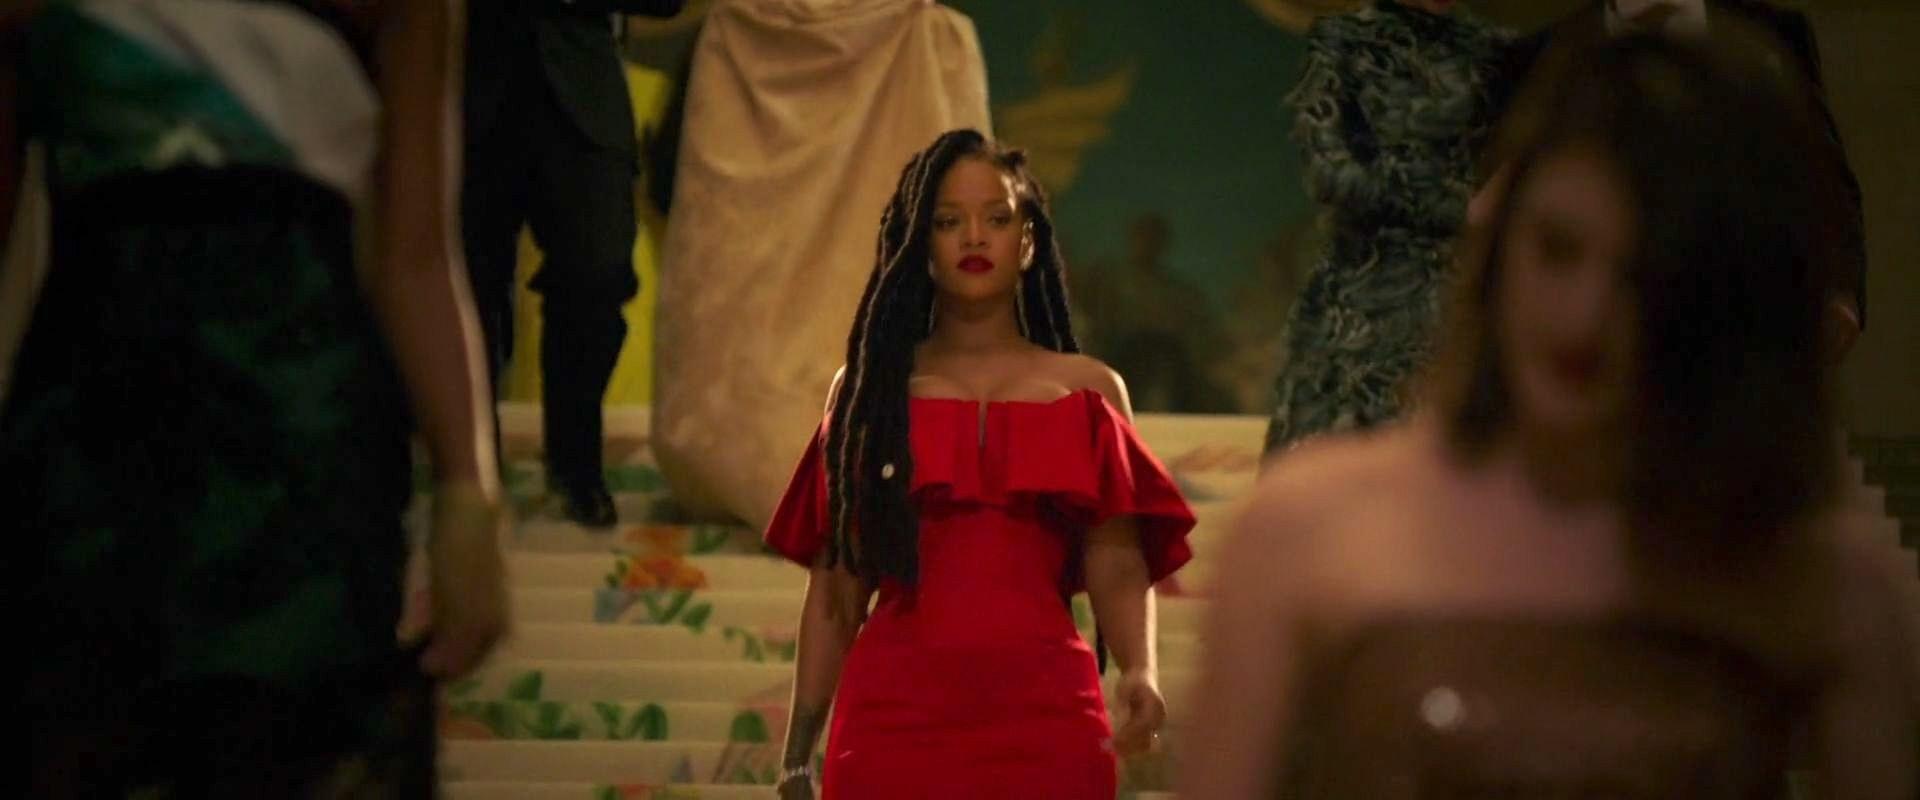 Rihanna walking down the stairs at the Met Gala in Ocean's 8